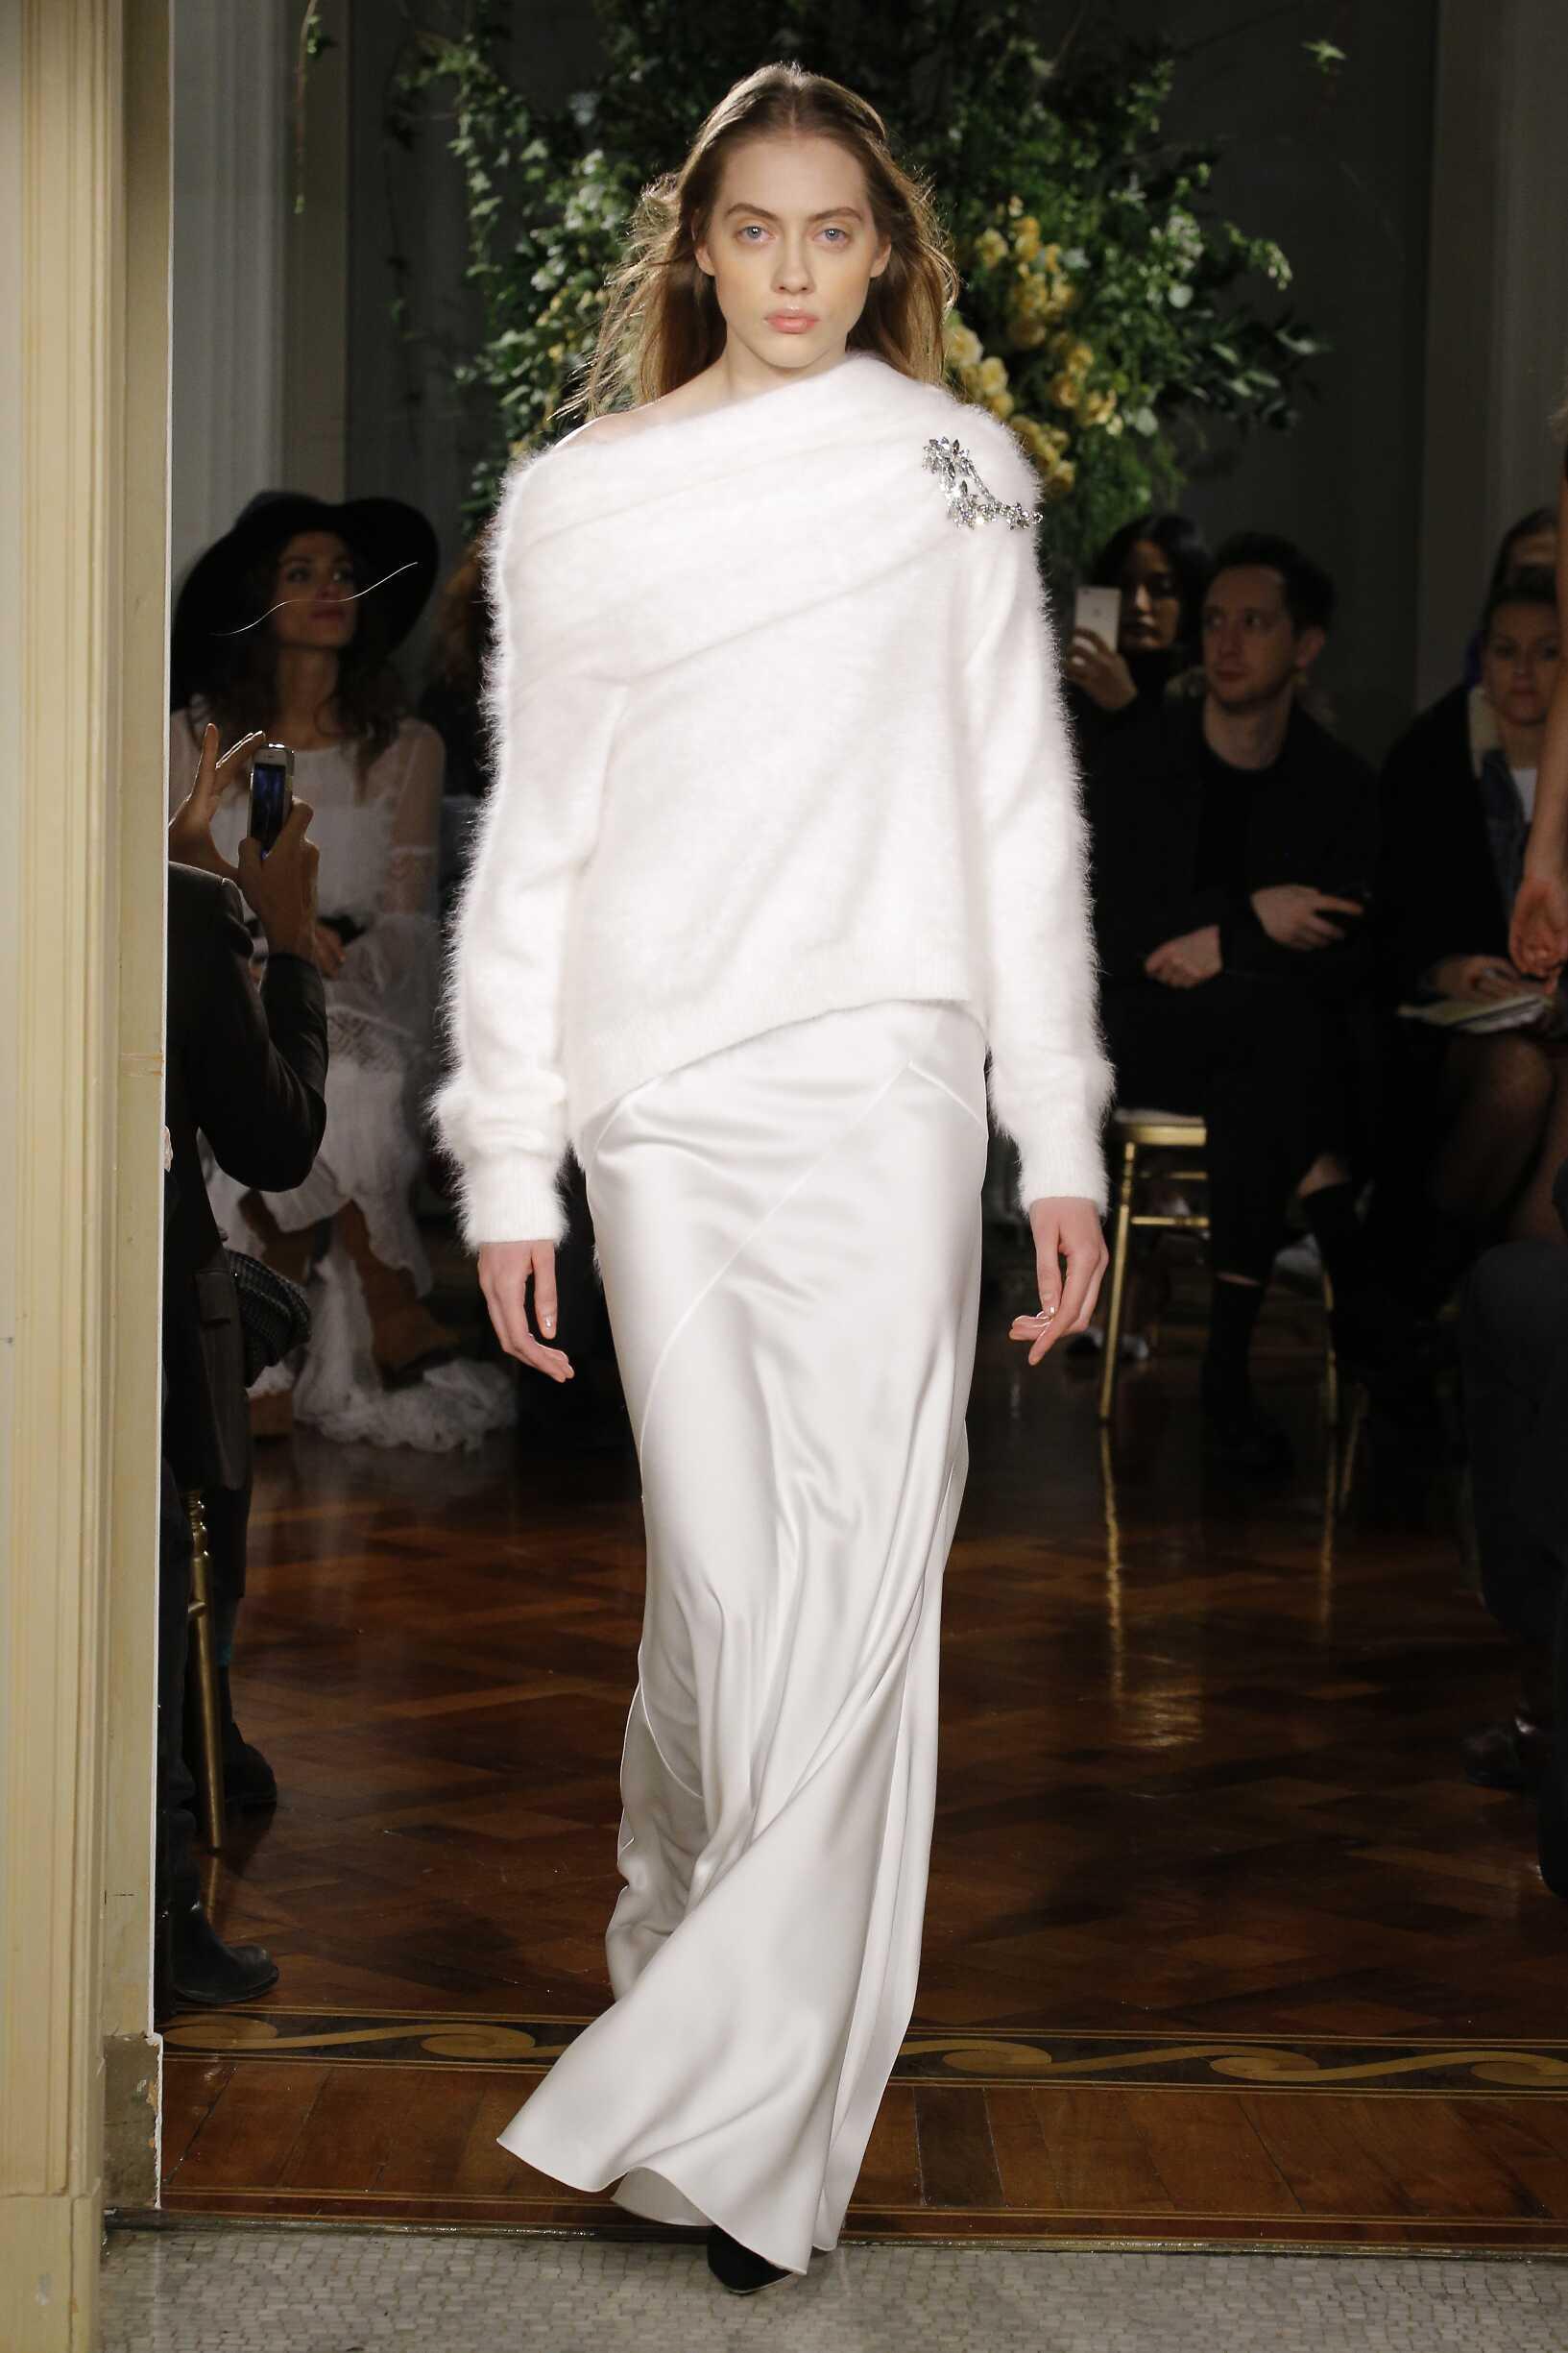 Alberta Ferretti Limited Edition Fashion Show